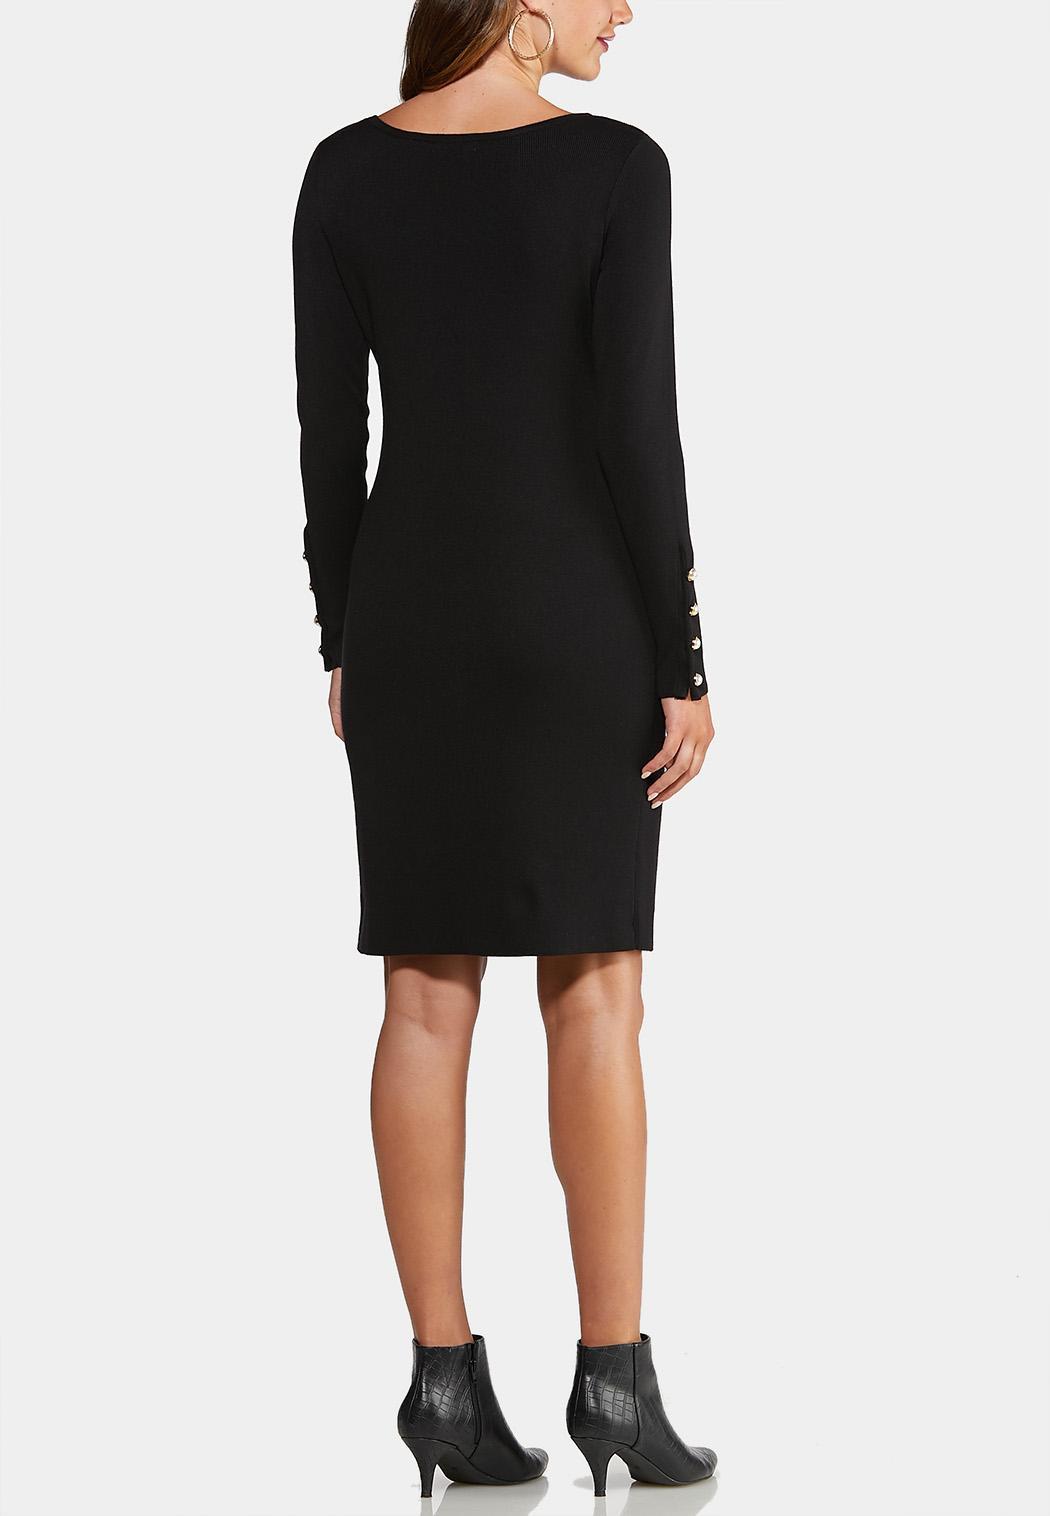 Plus Size Pearl Button Dress (Item #43989732)